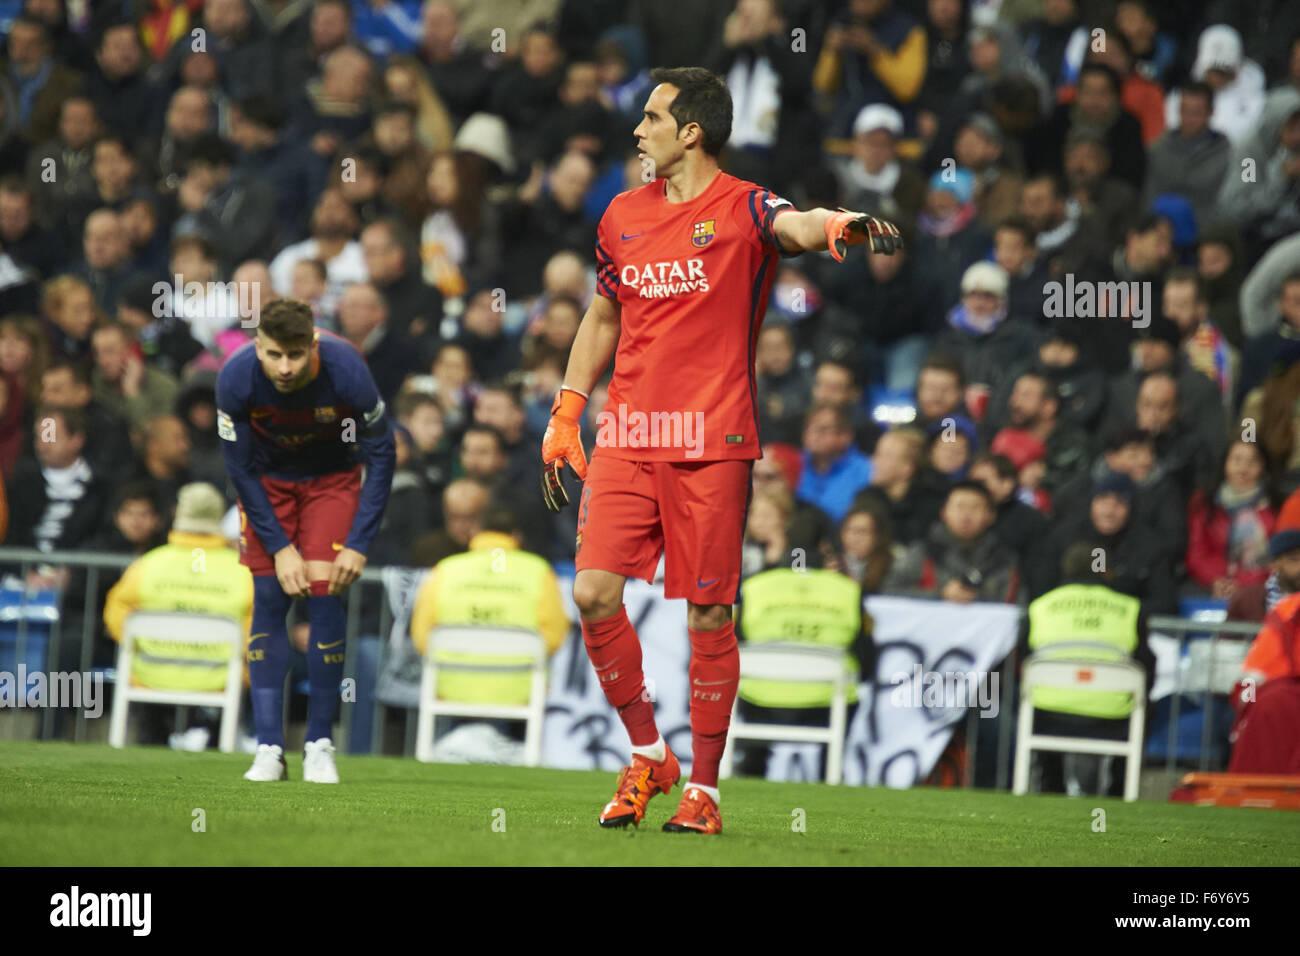 Madrid, Spain. 21st Nov, 2015. Claudio Bravo (goalkeeper, F.C. Barcelona) in action during La Liga match between Stock Photo